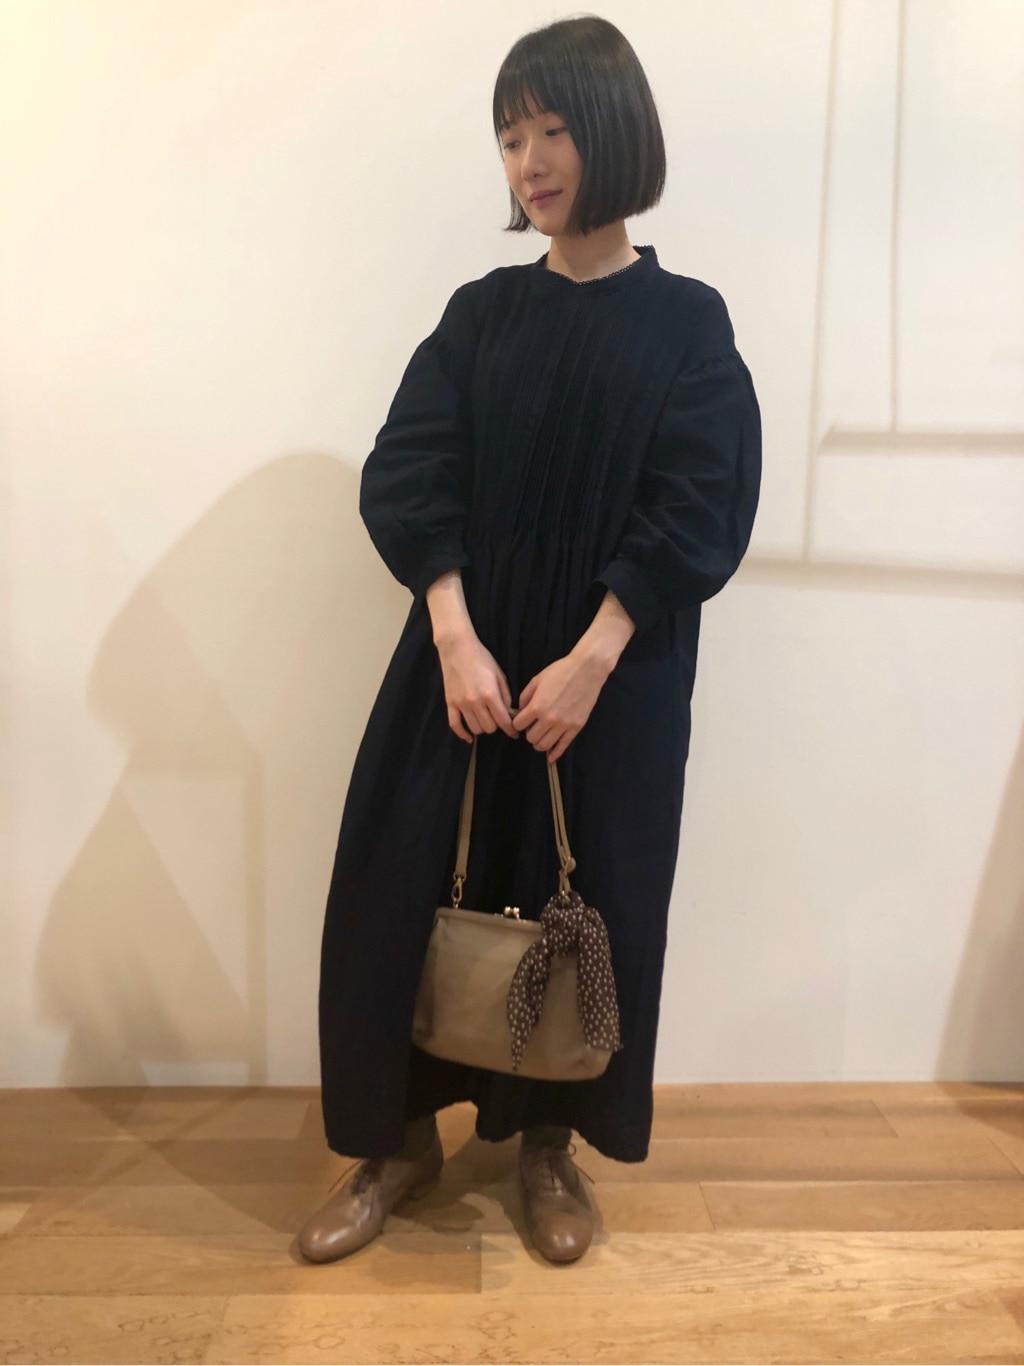 bulle de savon KITTE丸の内 身長:152cm 2020.09.30